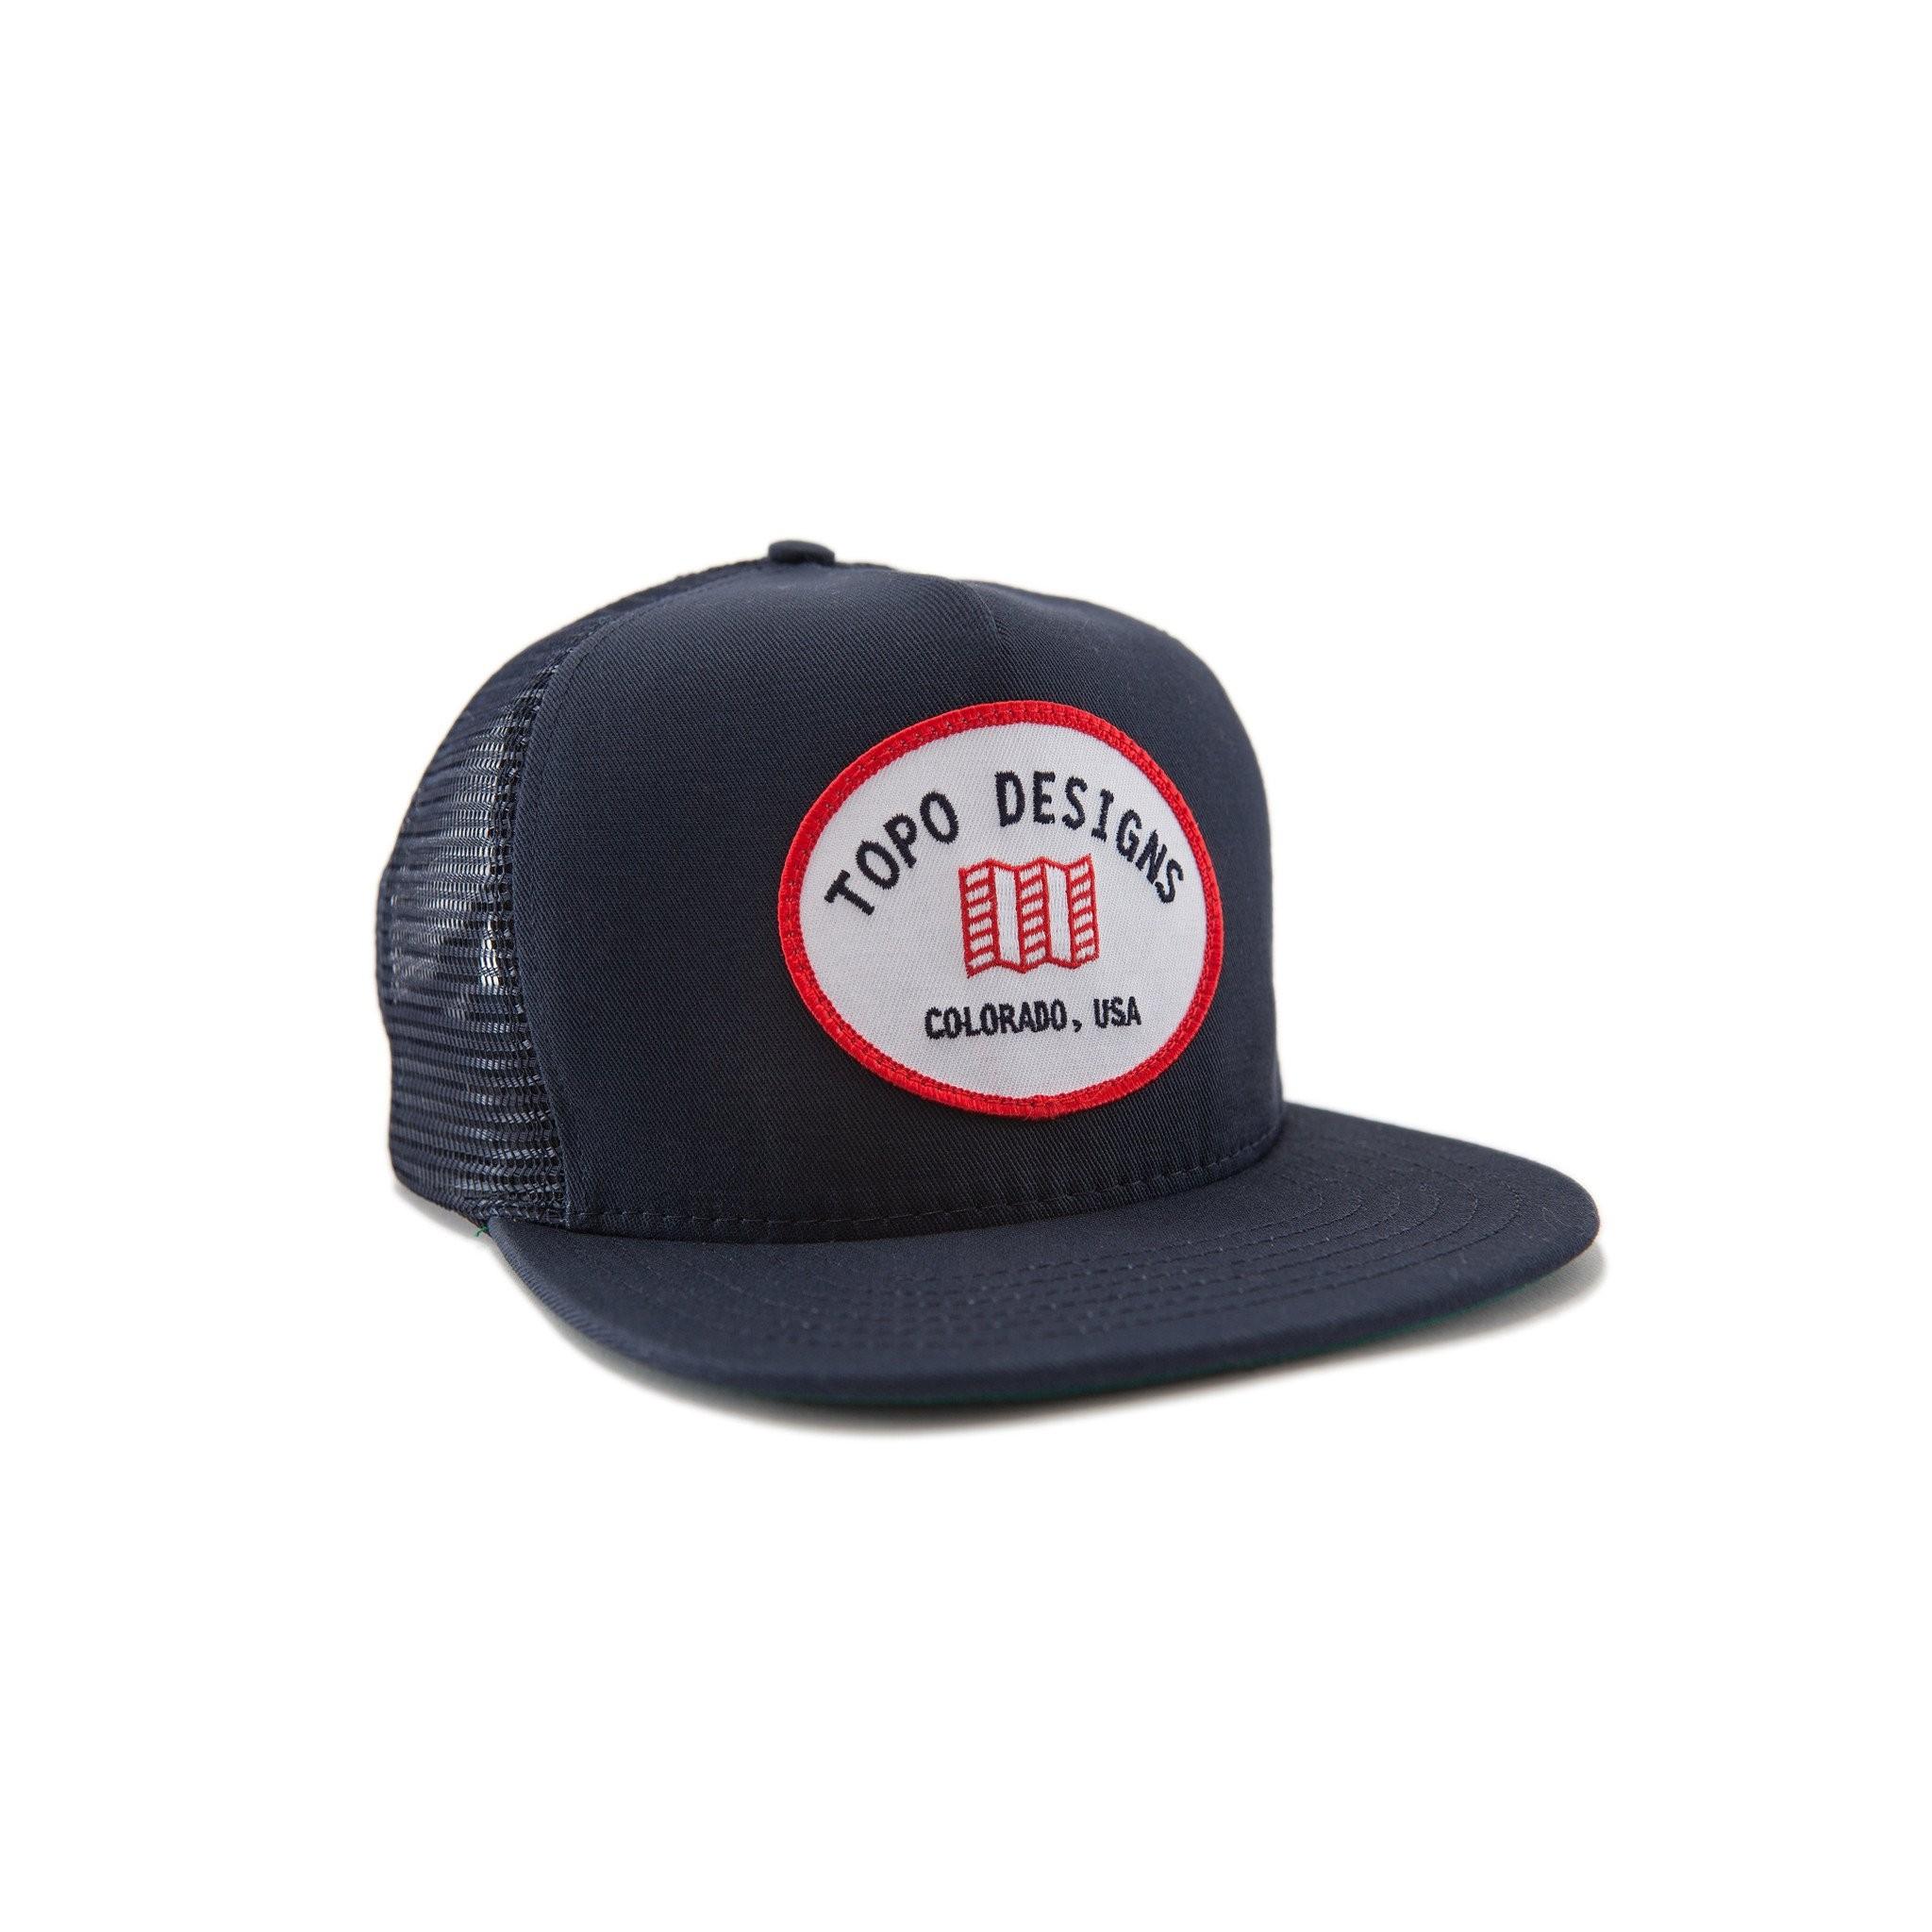 Topo Designs Snapback Hat : Navy